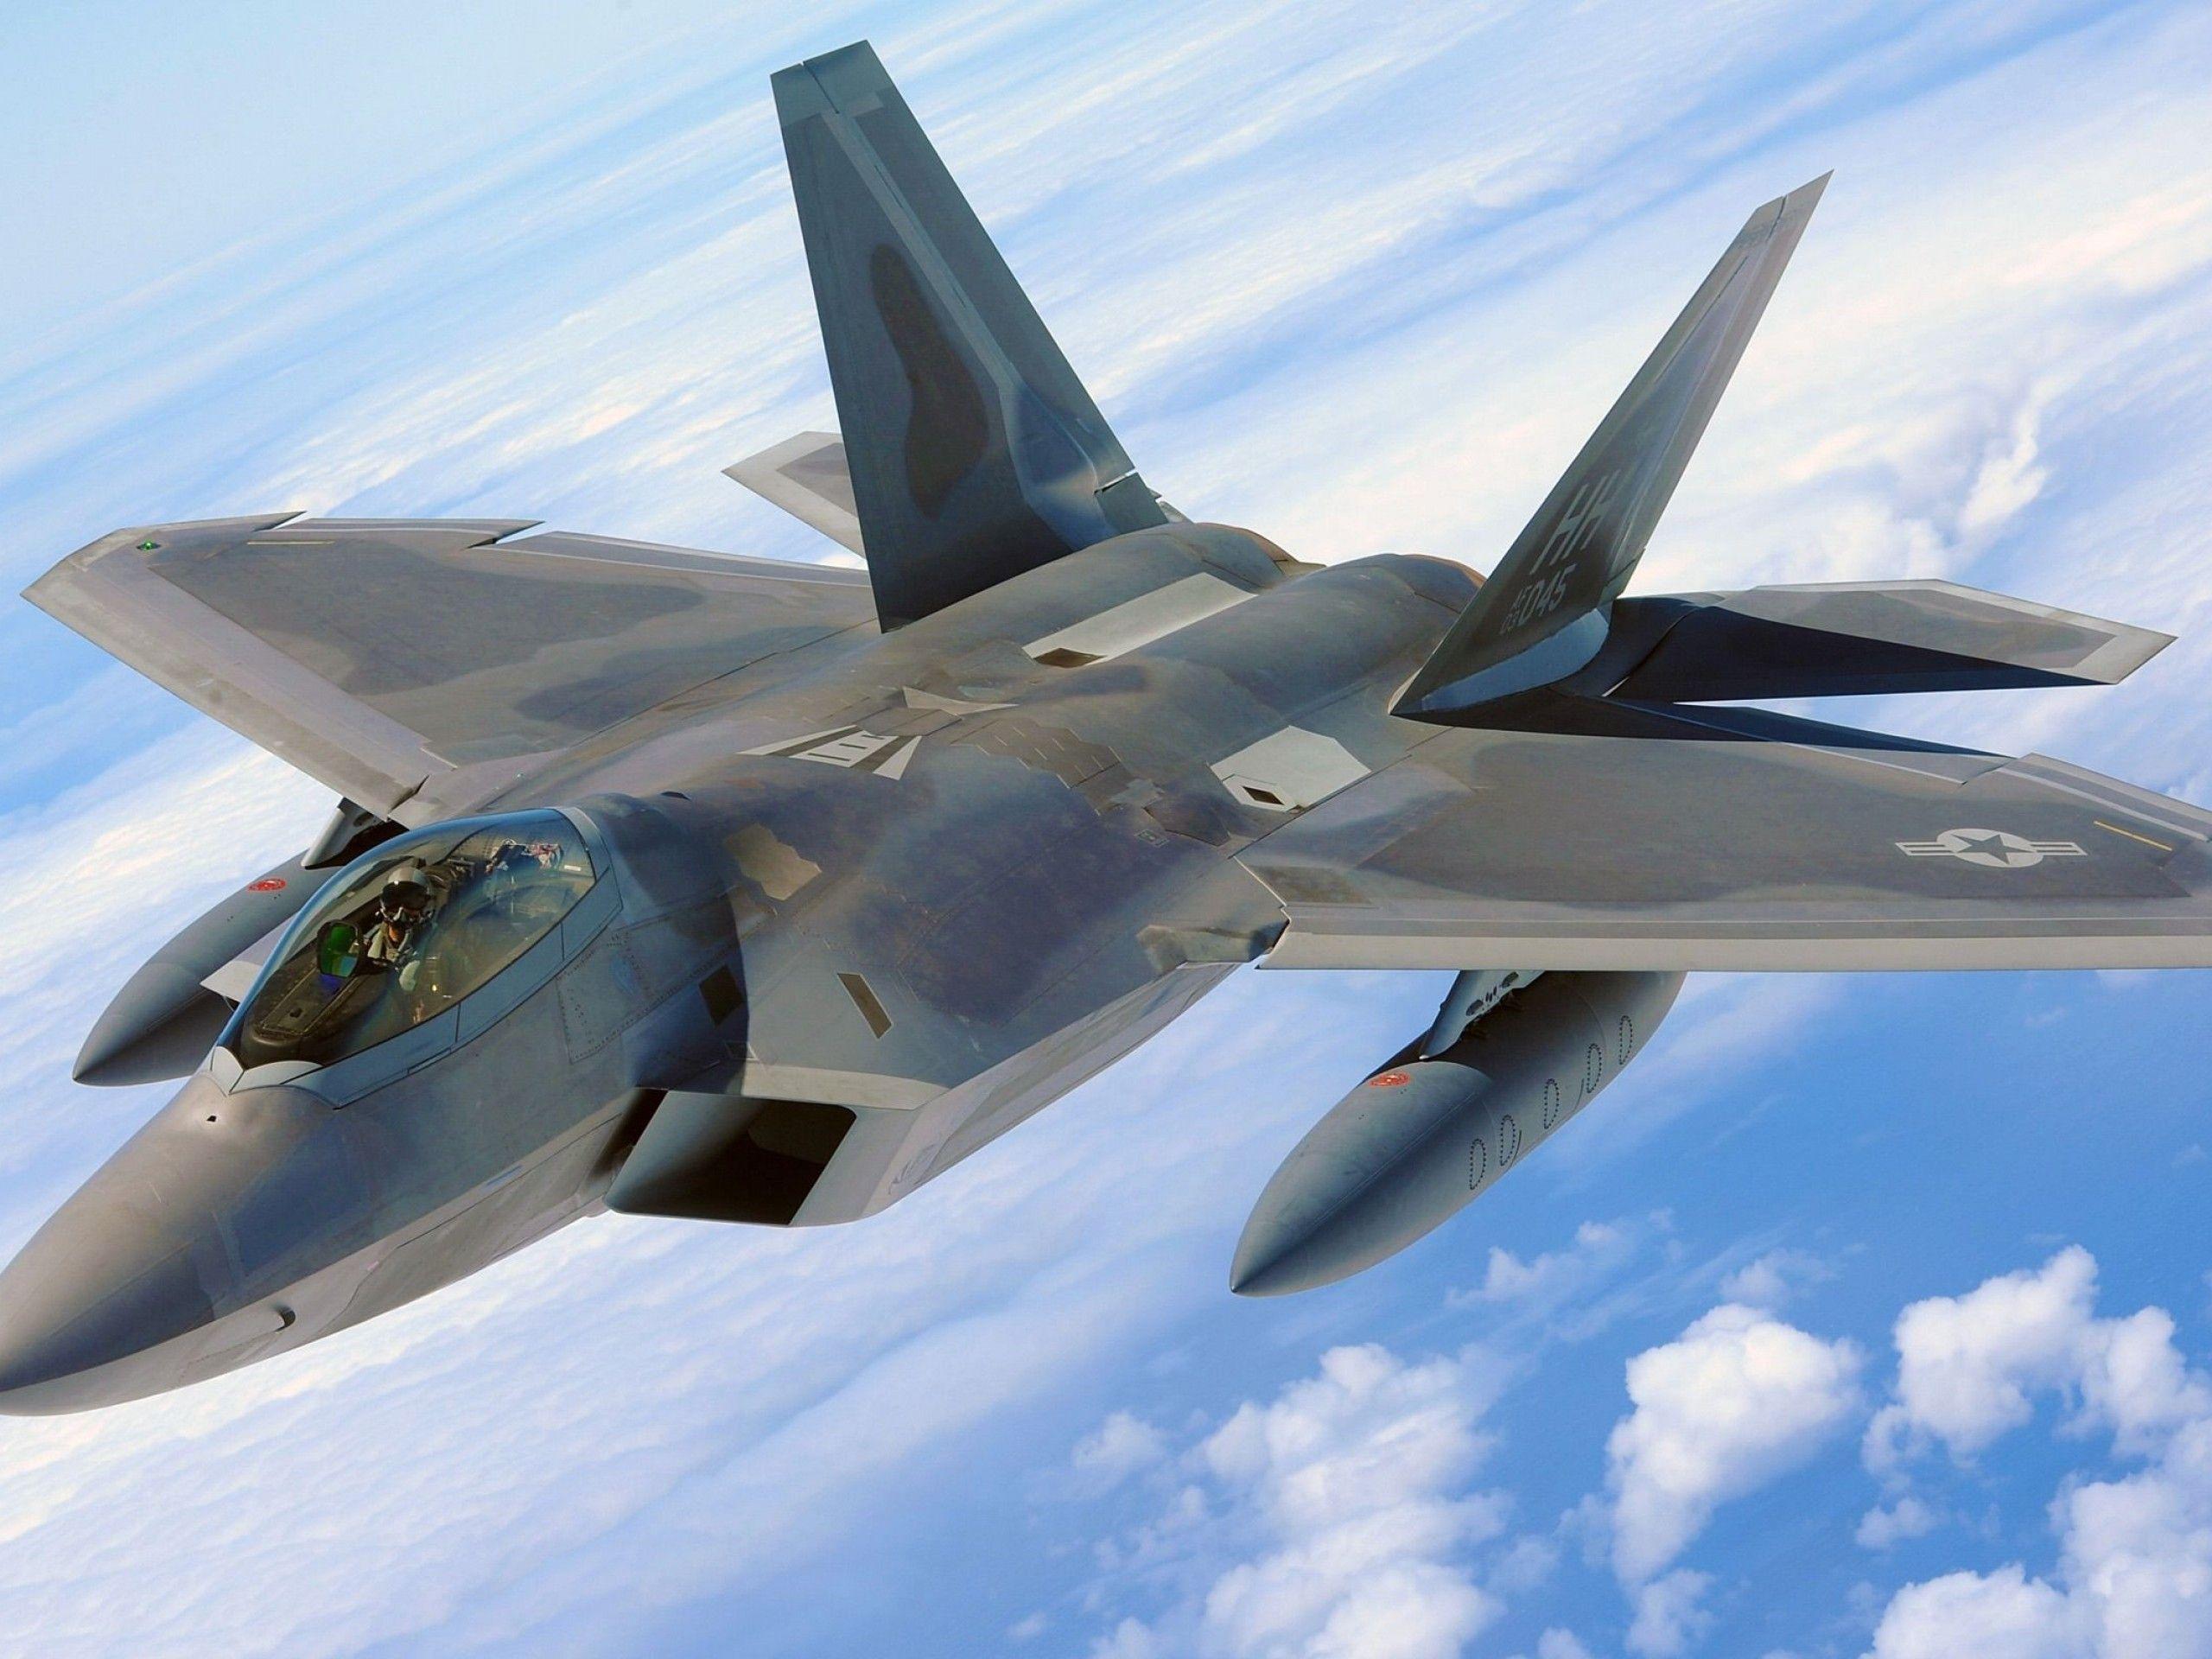 Lockheed Martin F 22 Raptor Fighter Jets Aircraft Military Aircraft